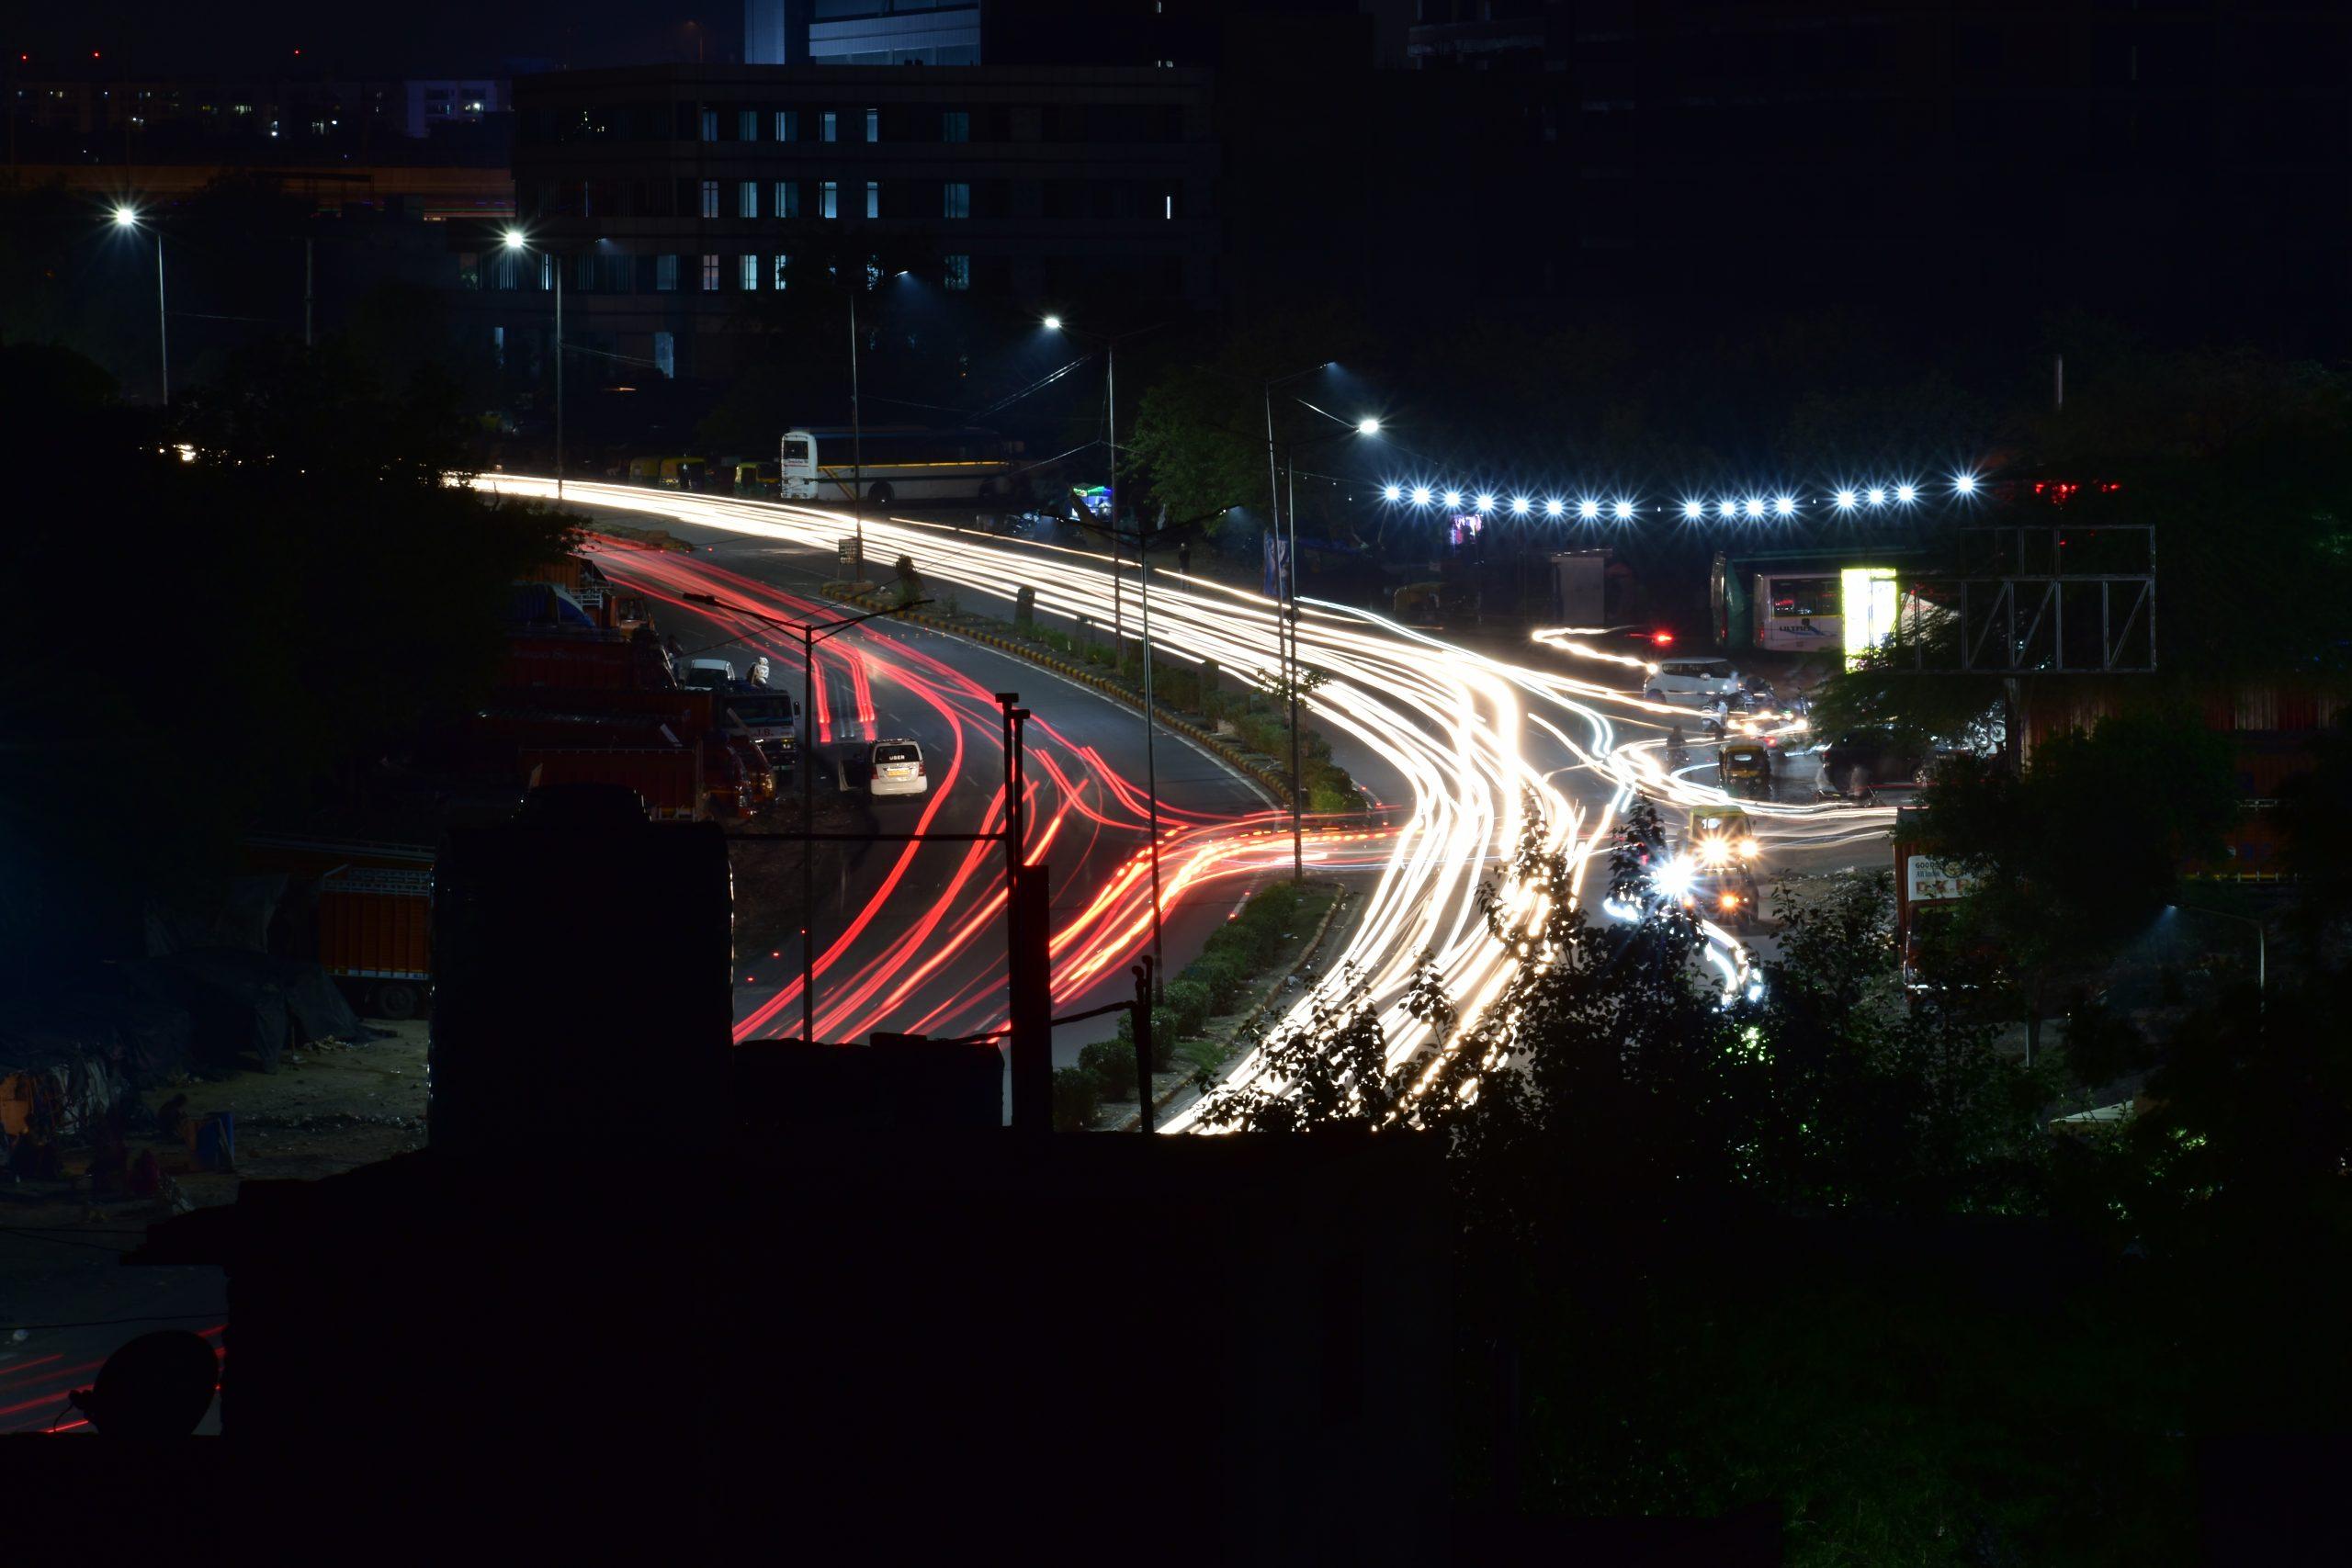 Streak of lights on the road